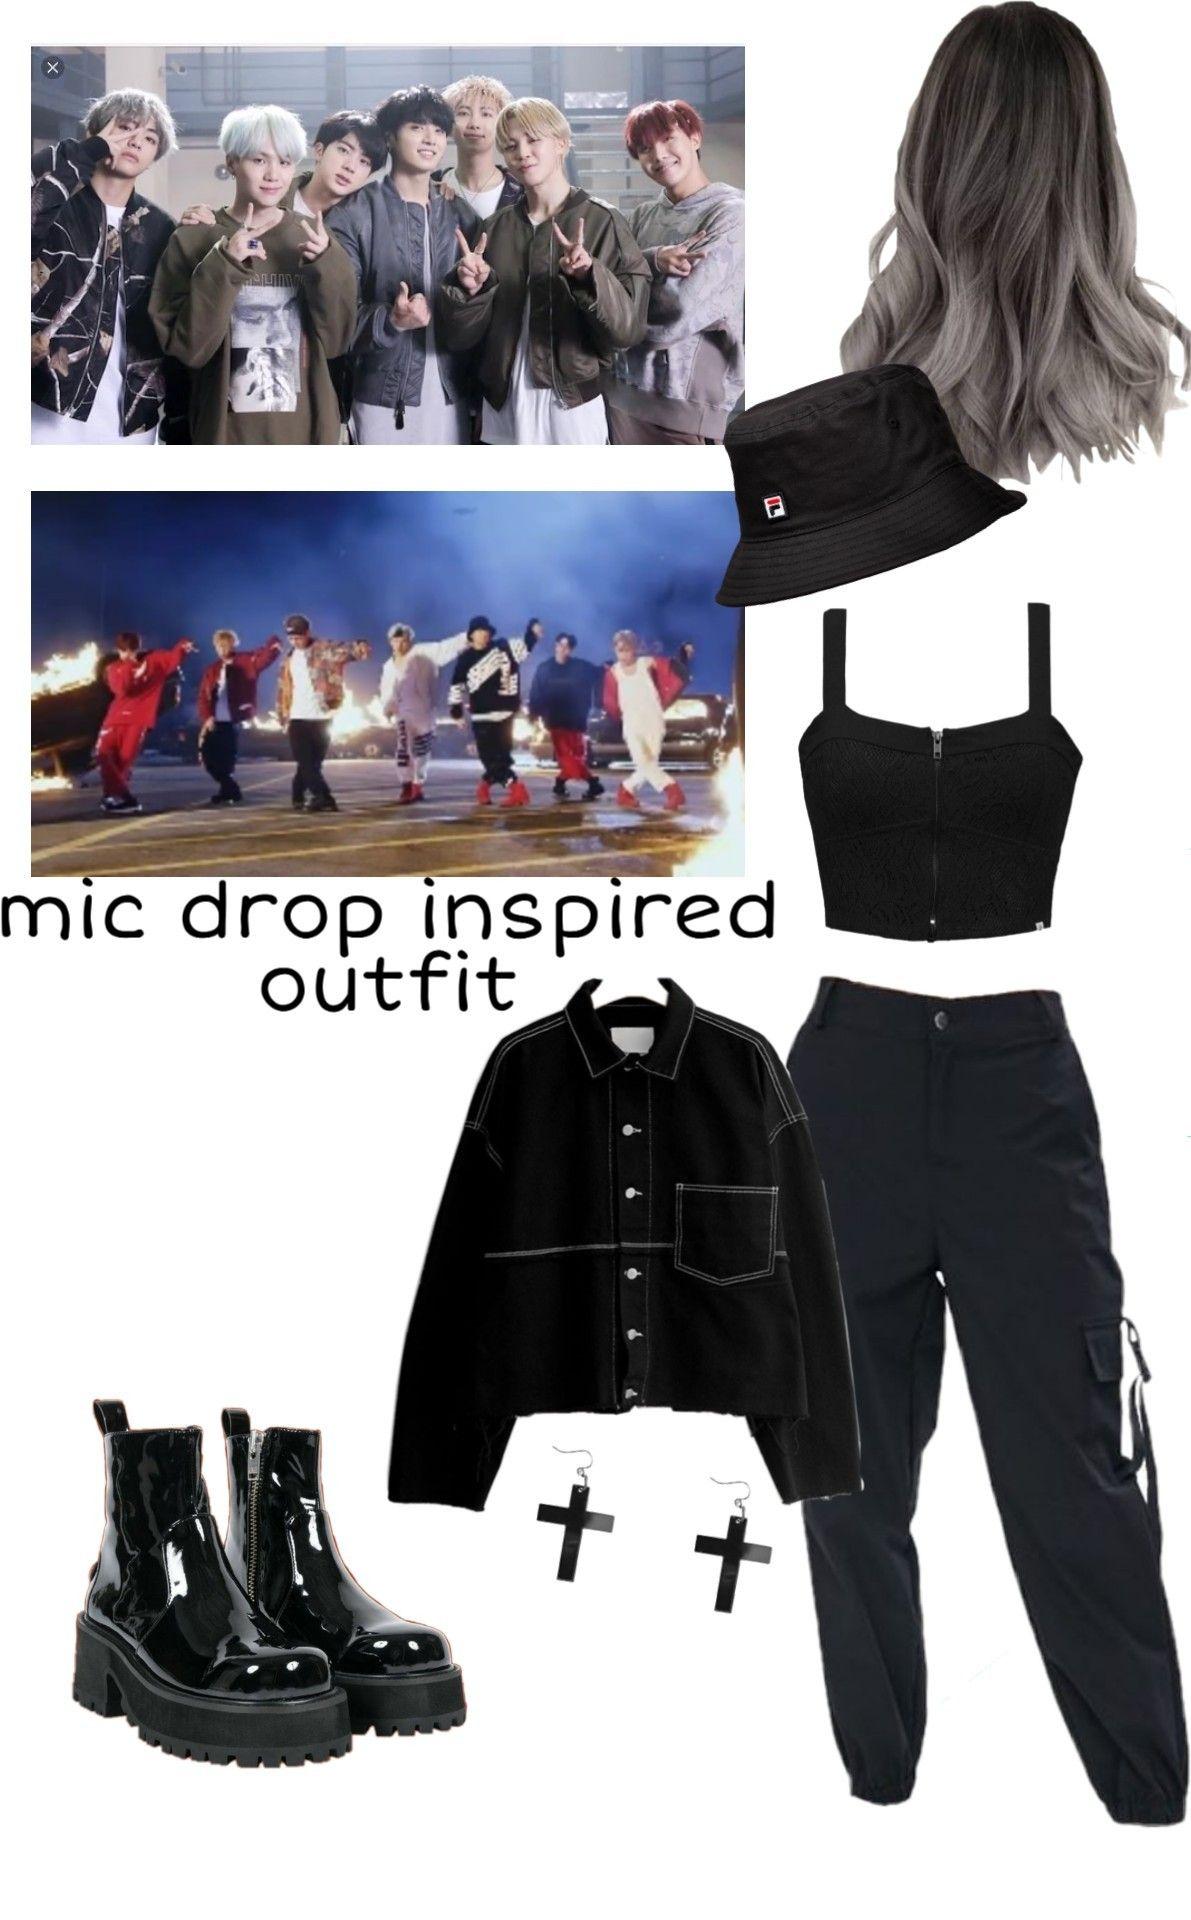 Chewii on Twitter   Korean fashion kpop inspired outfits, Fashion, Kpop fashion